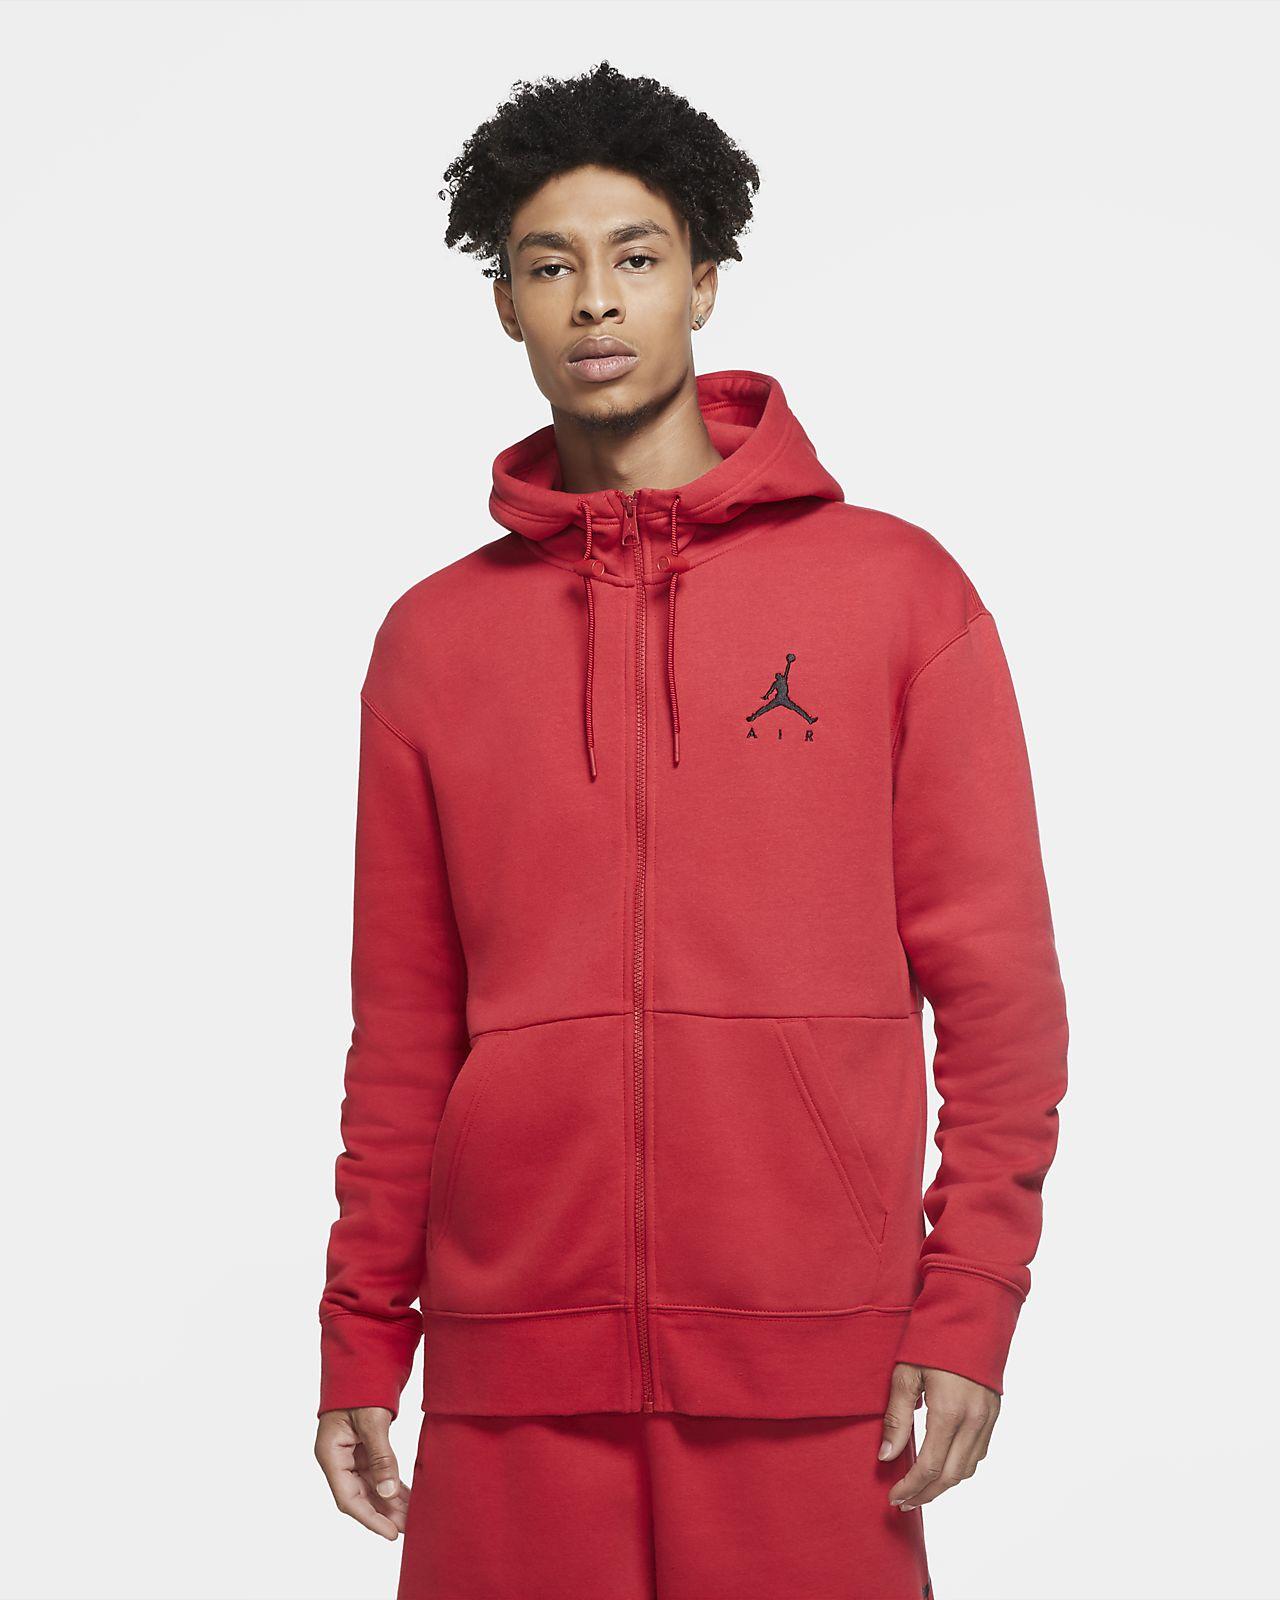 Felpa in fleece con cappuccio e zip a tutta lunghezza Jordan Jumpman Air - Uomo